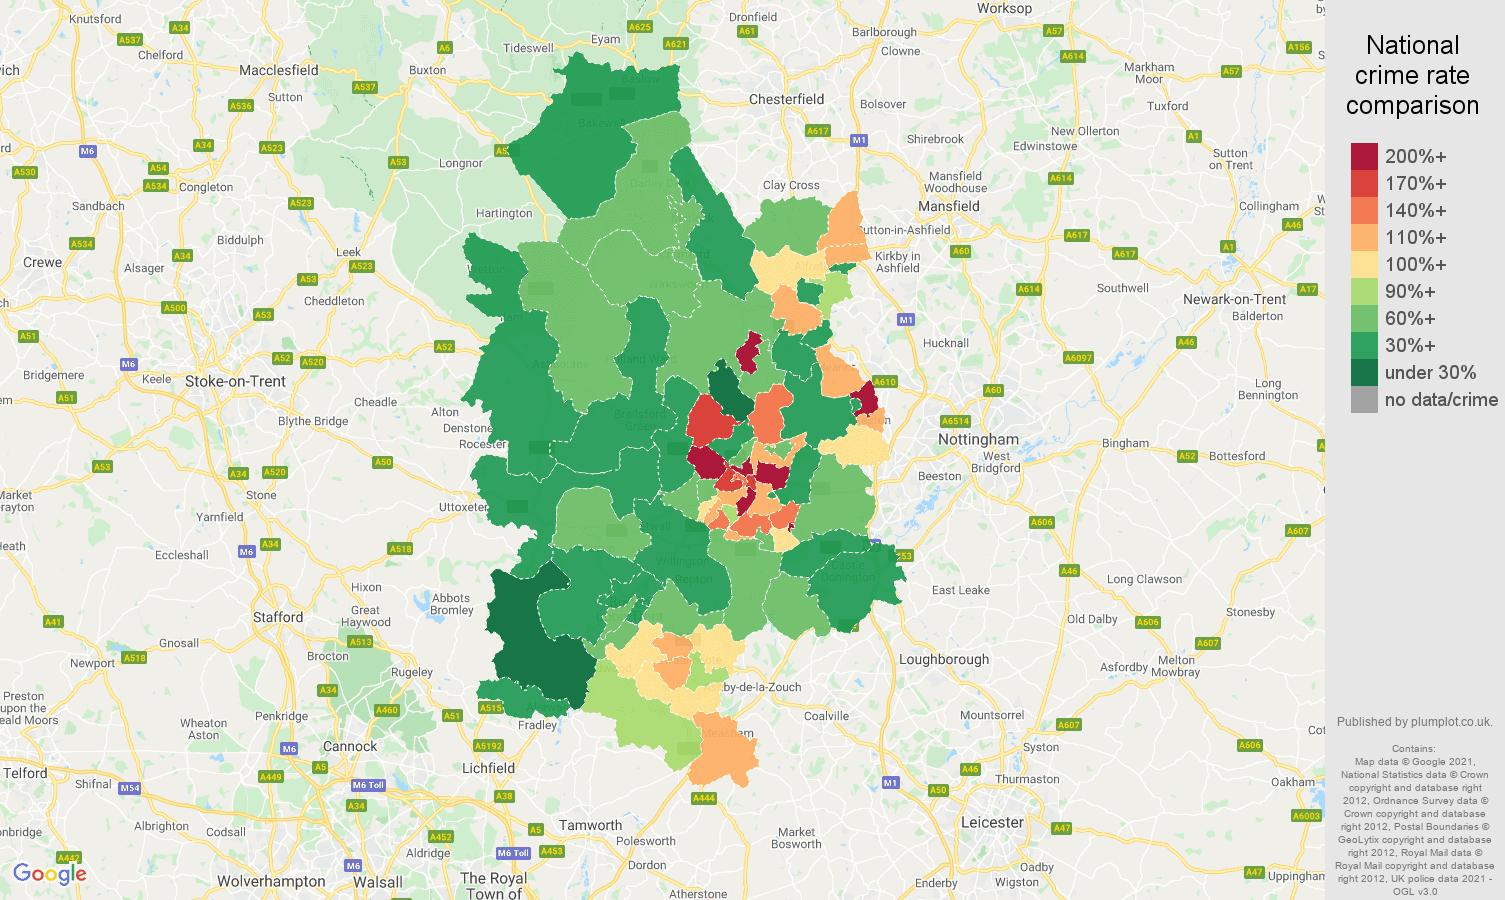 Derby criminal damage and arson crime rate comparison map